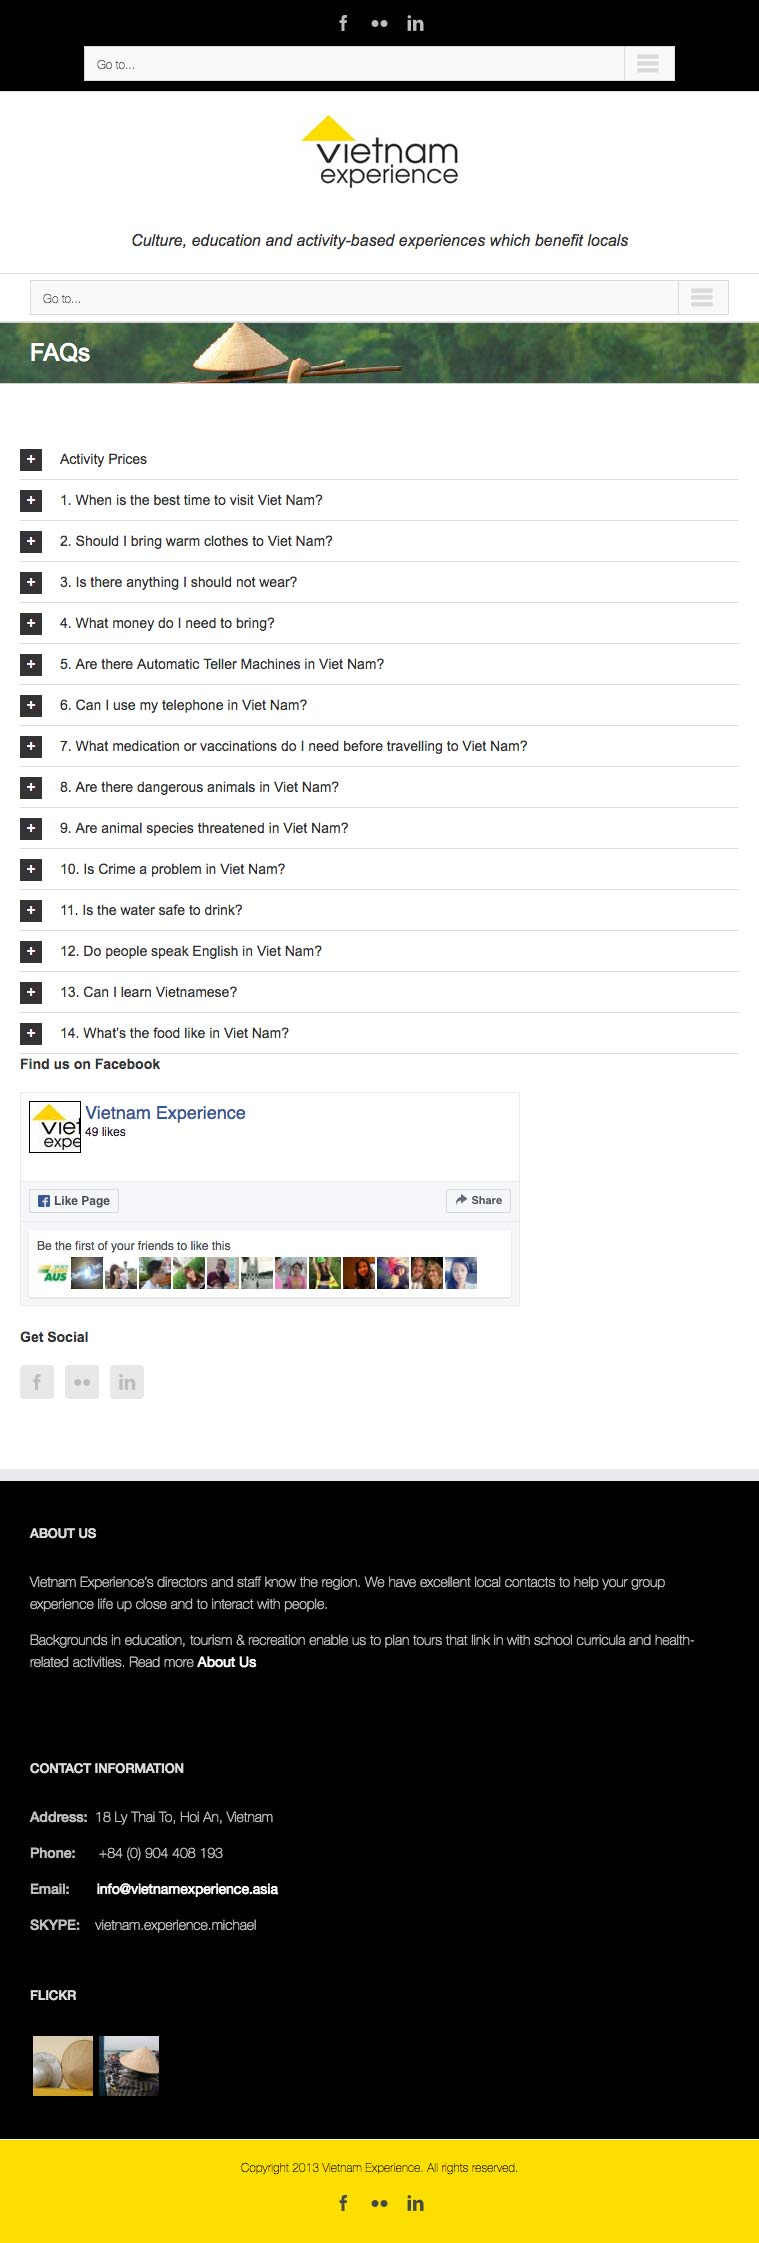 Vietnam Experience FAQ web page